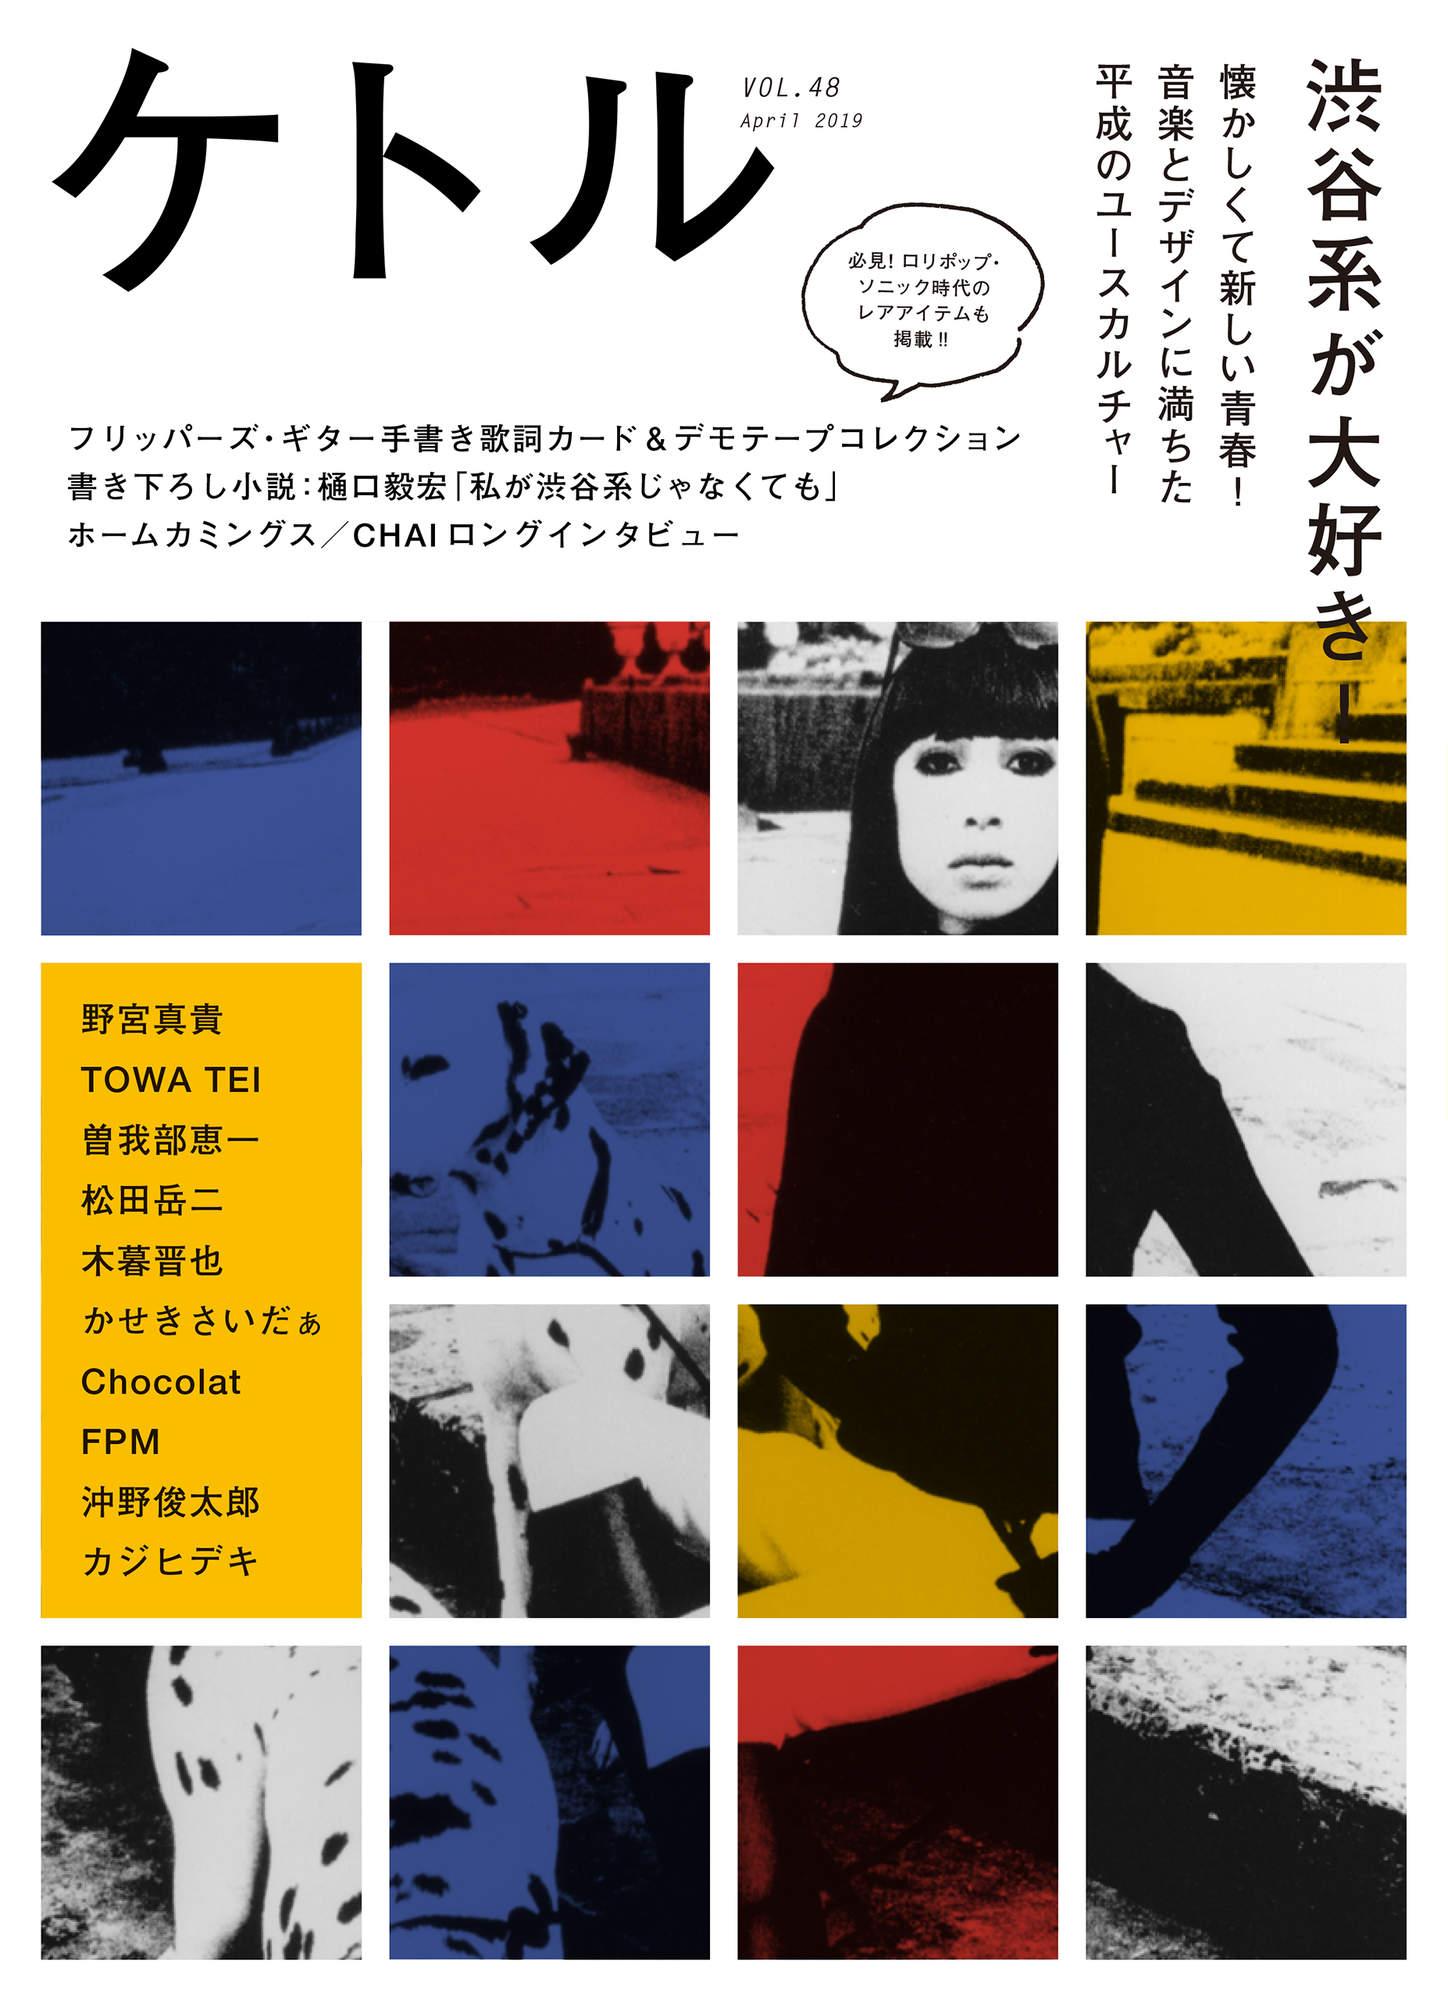 http://rose-records.jp/files/20190415123543.jpg